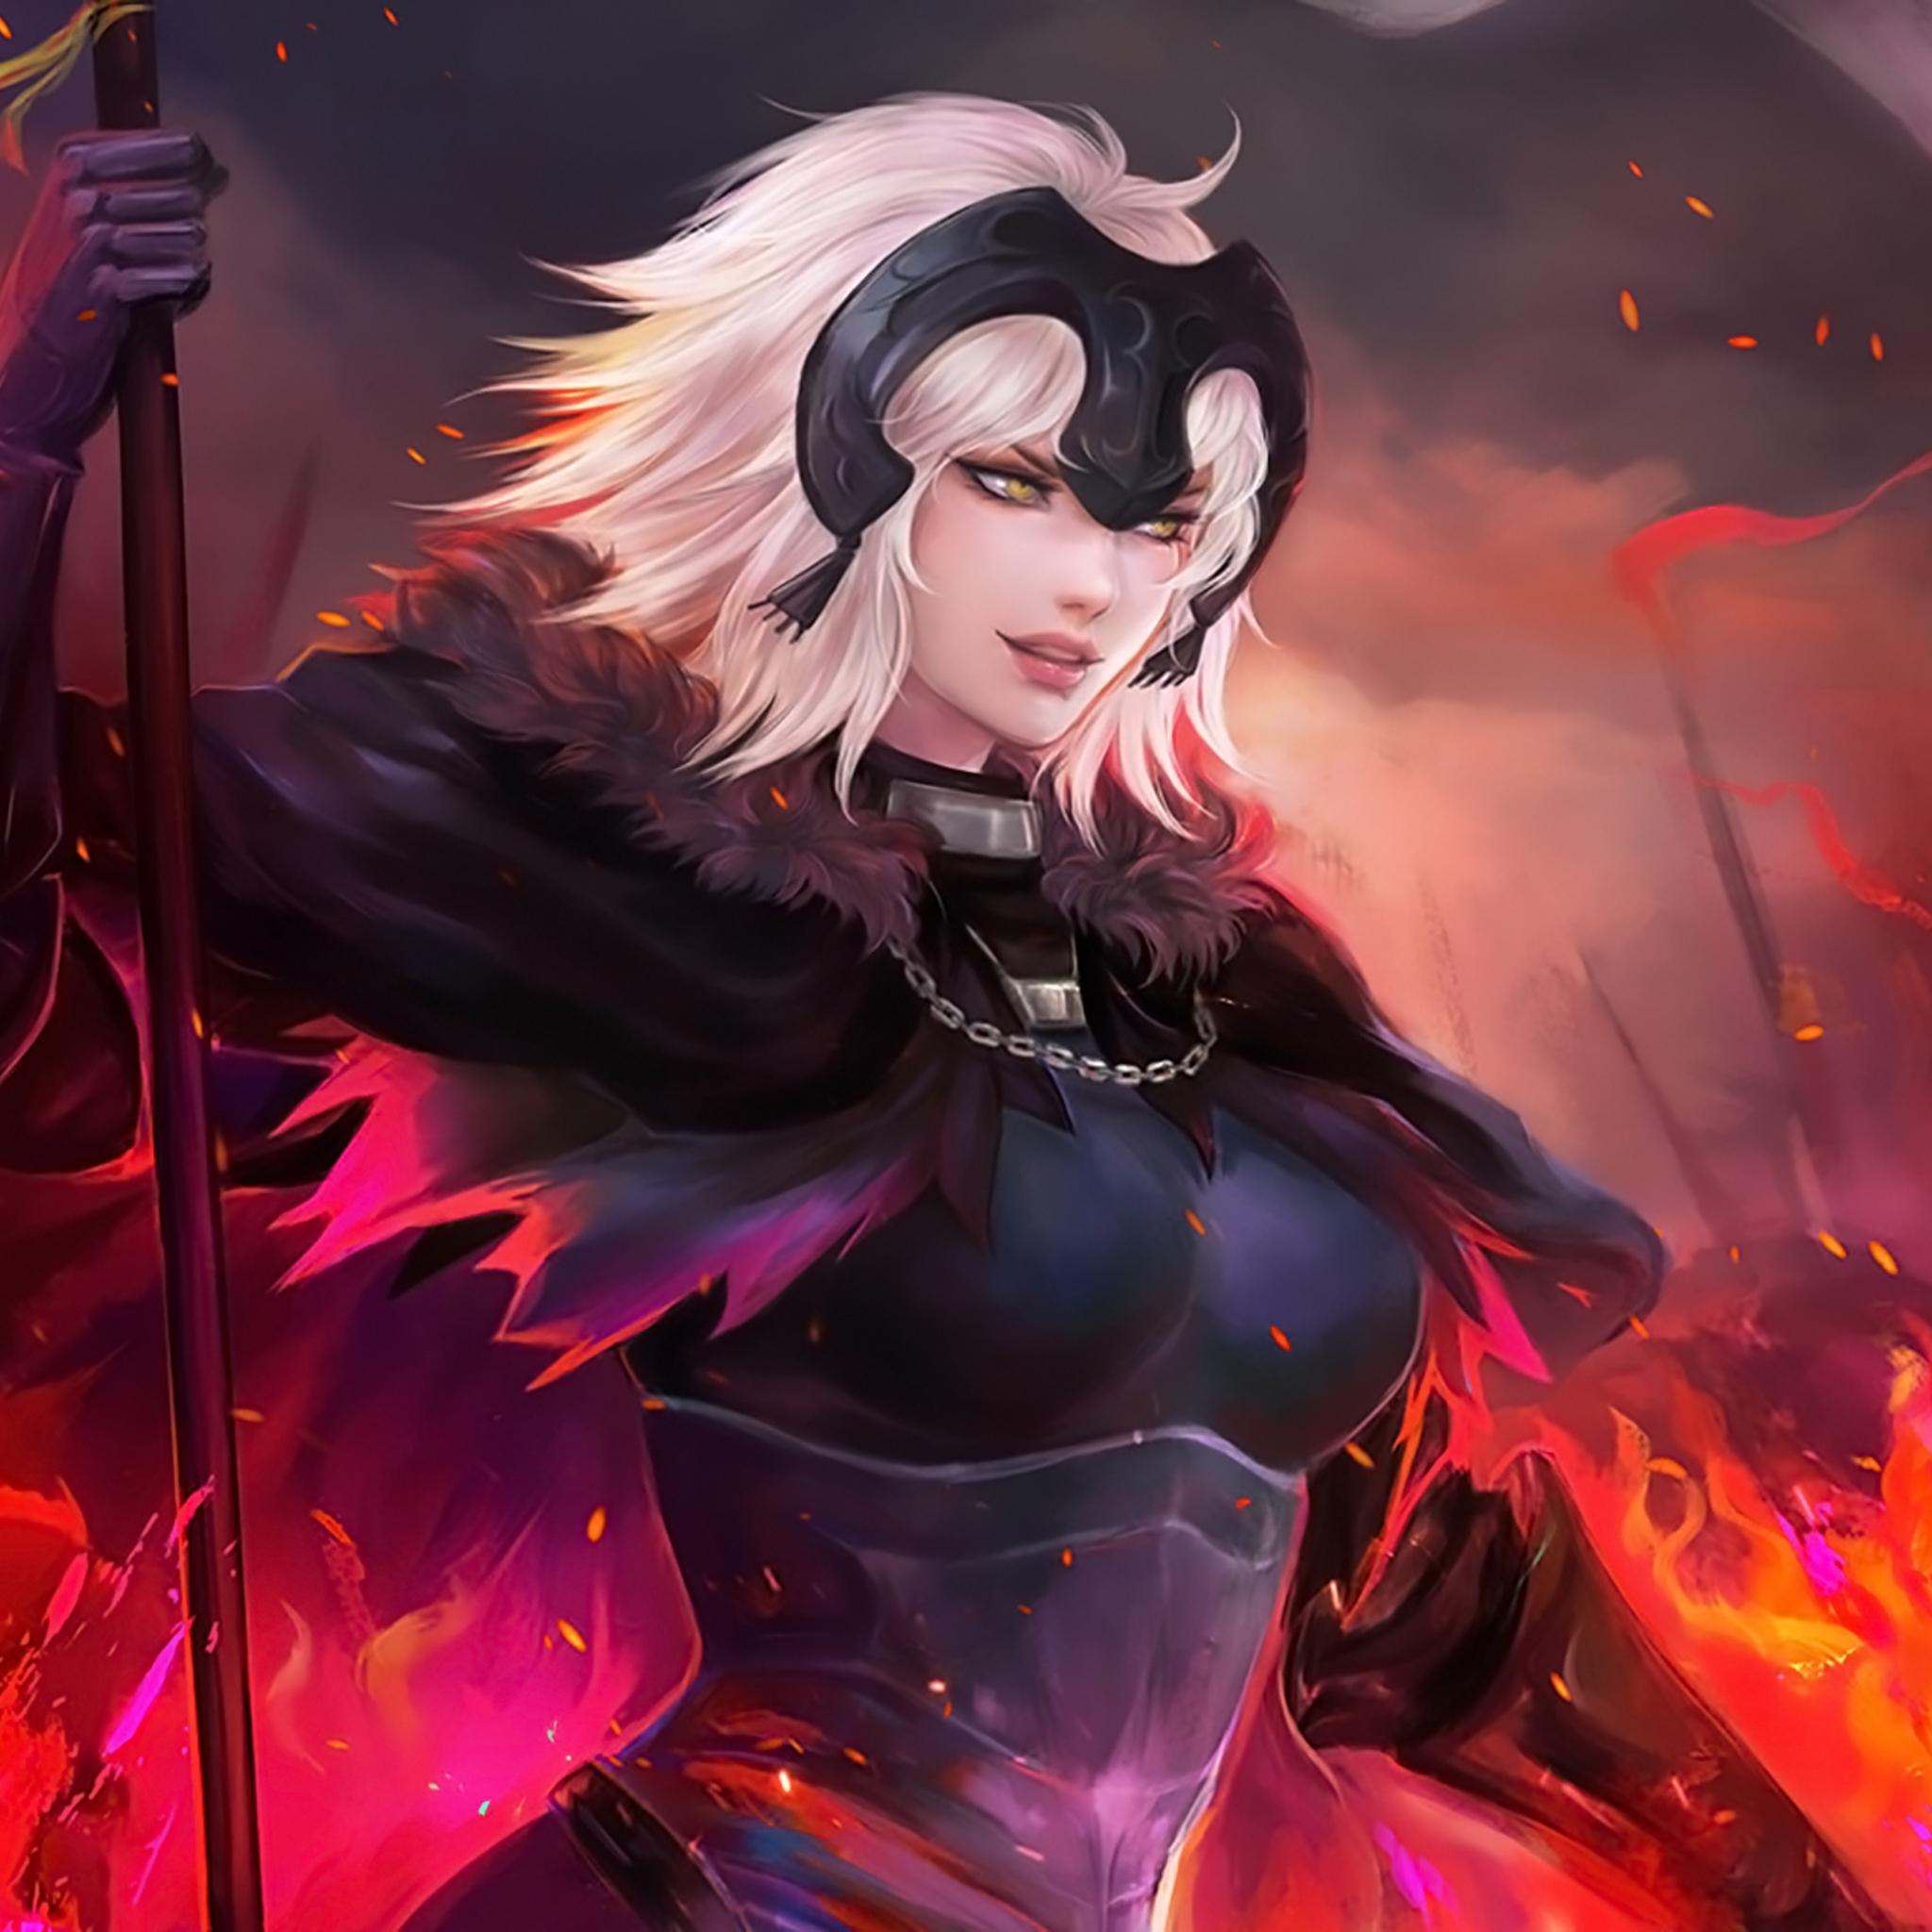 2048x2048 Jeanne Alter Anime Fate Grand Order Ipad Air Hd 4k